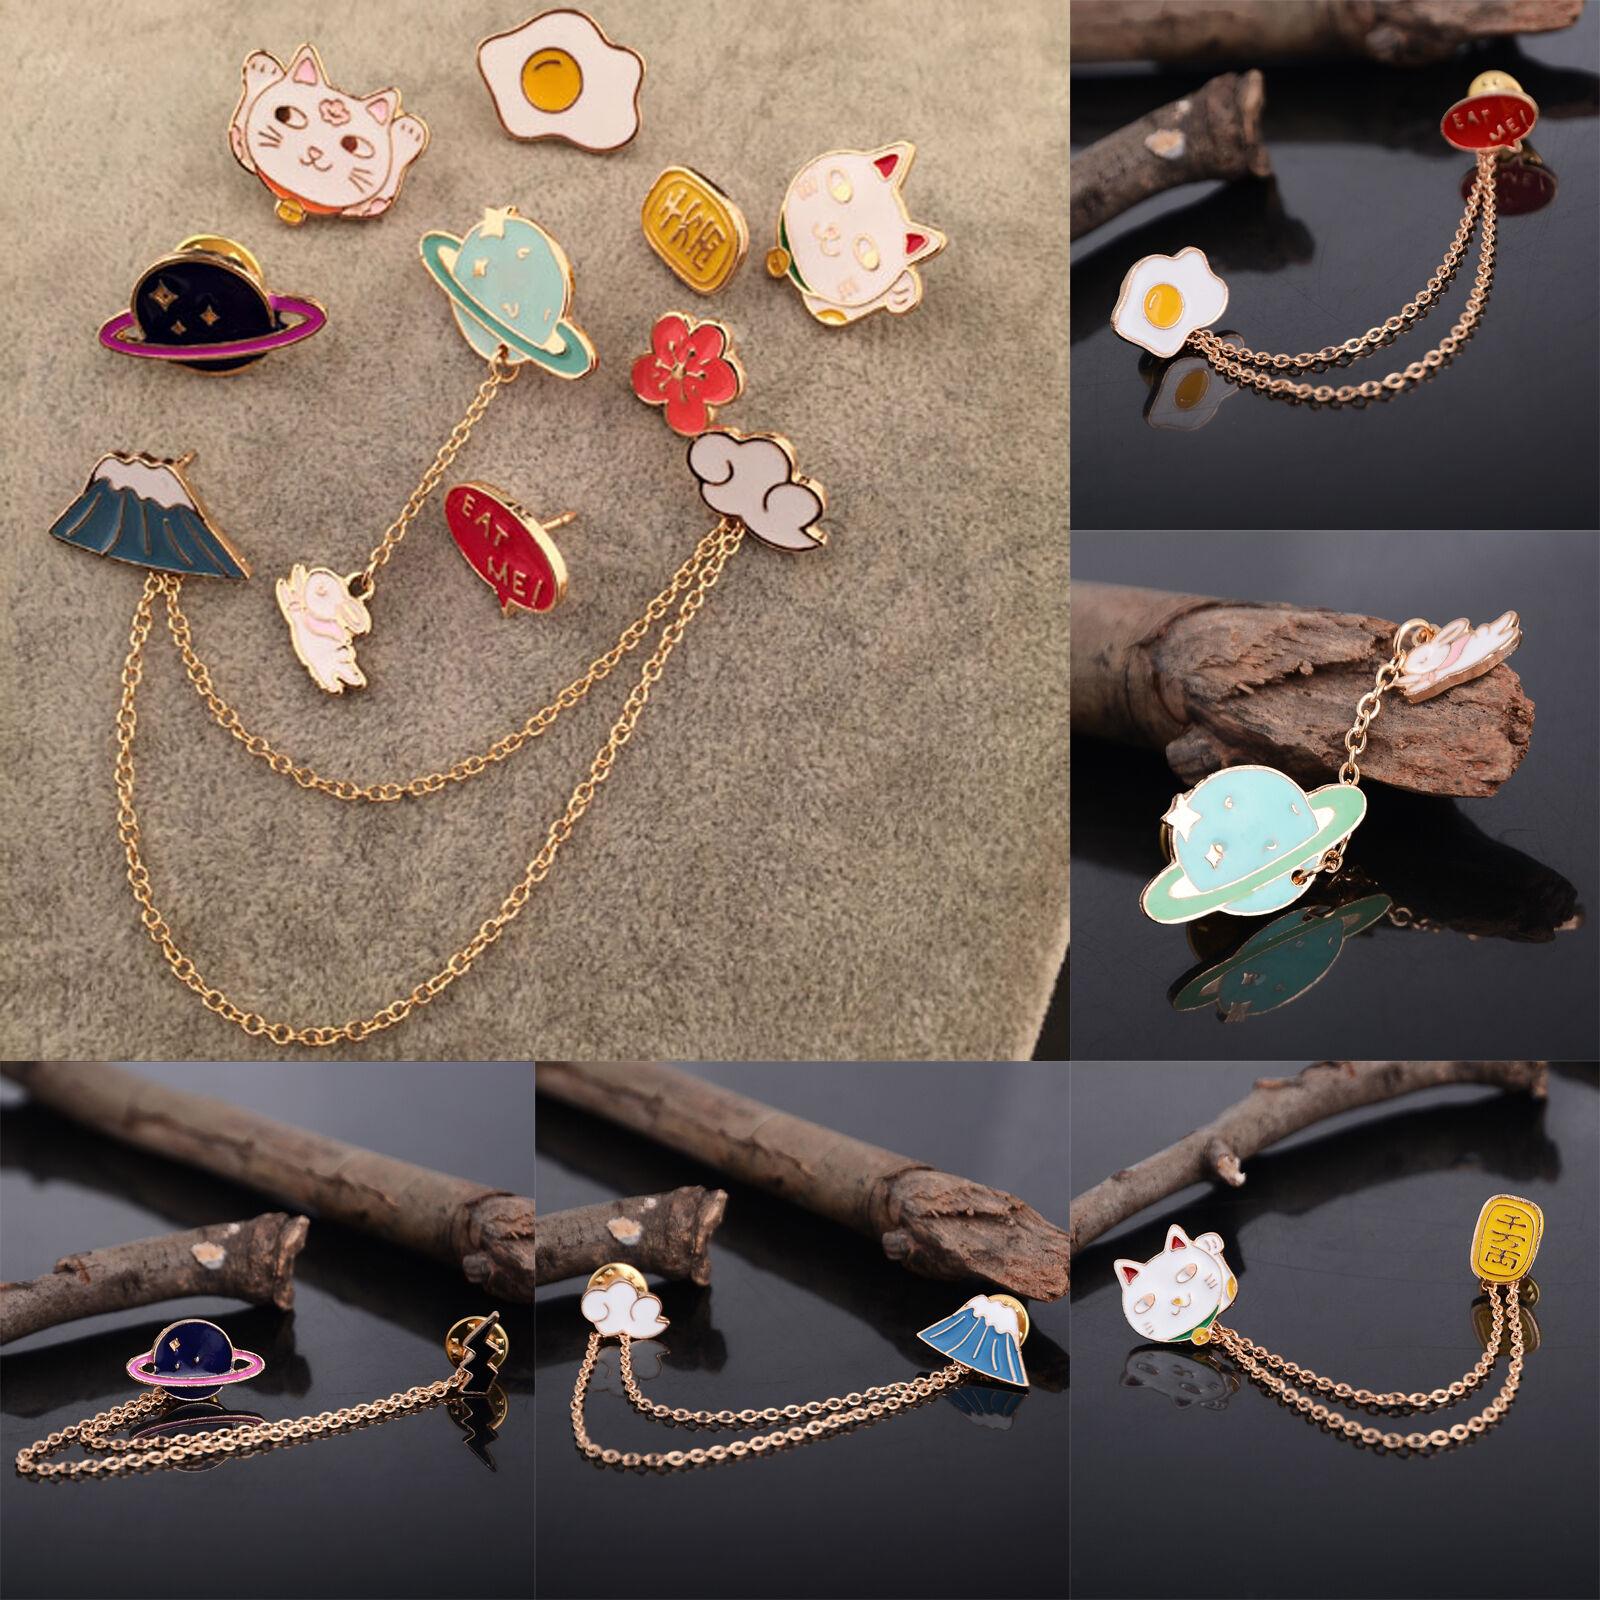 1a3b9e052ff Fashion Cute Enamel Collar Pin Badge Corsage Cartoon Metal Brooch Pins  Jewelry 2 2 of 12 ...